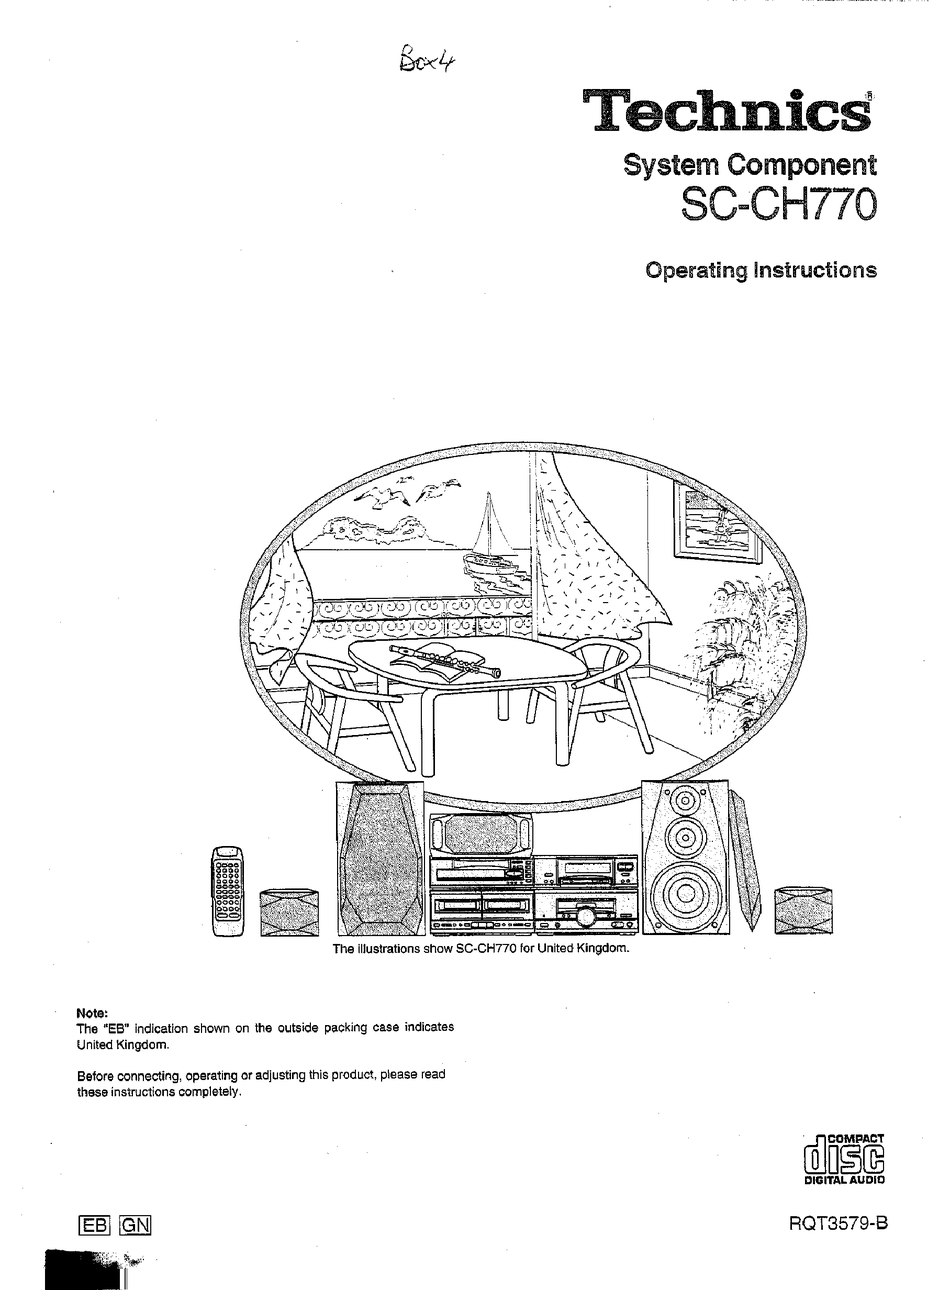 TECHNICS SC-CH770 OPERATING INSTRUCTIONS MANUAL Pdf